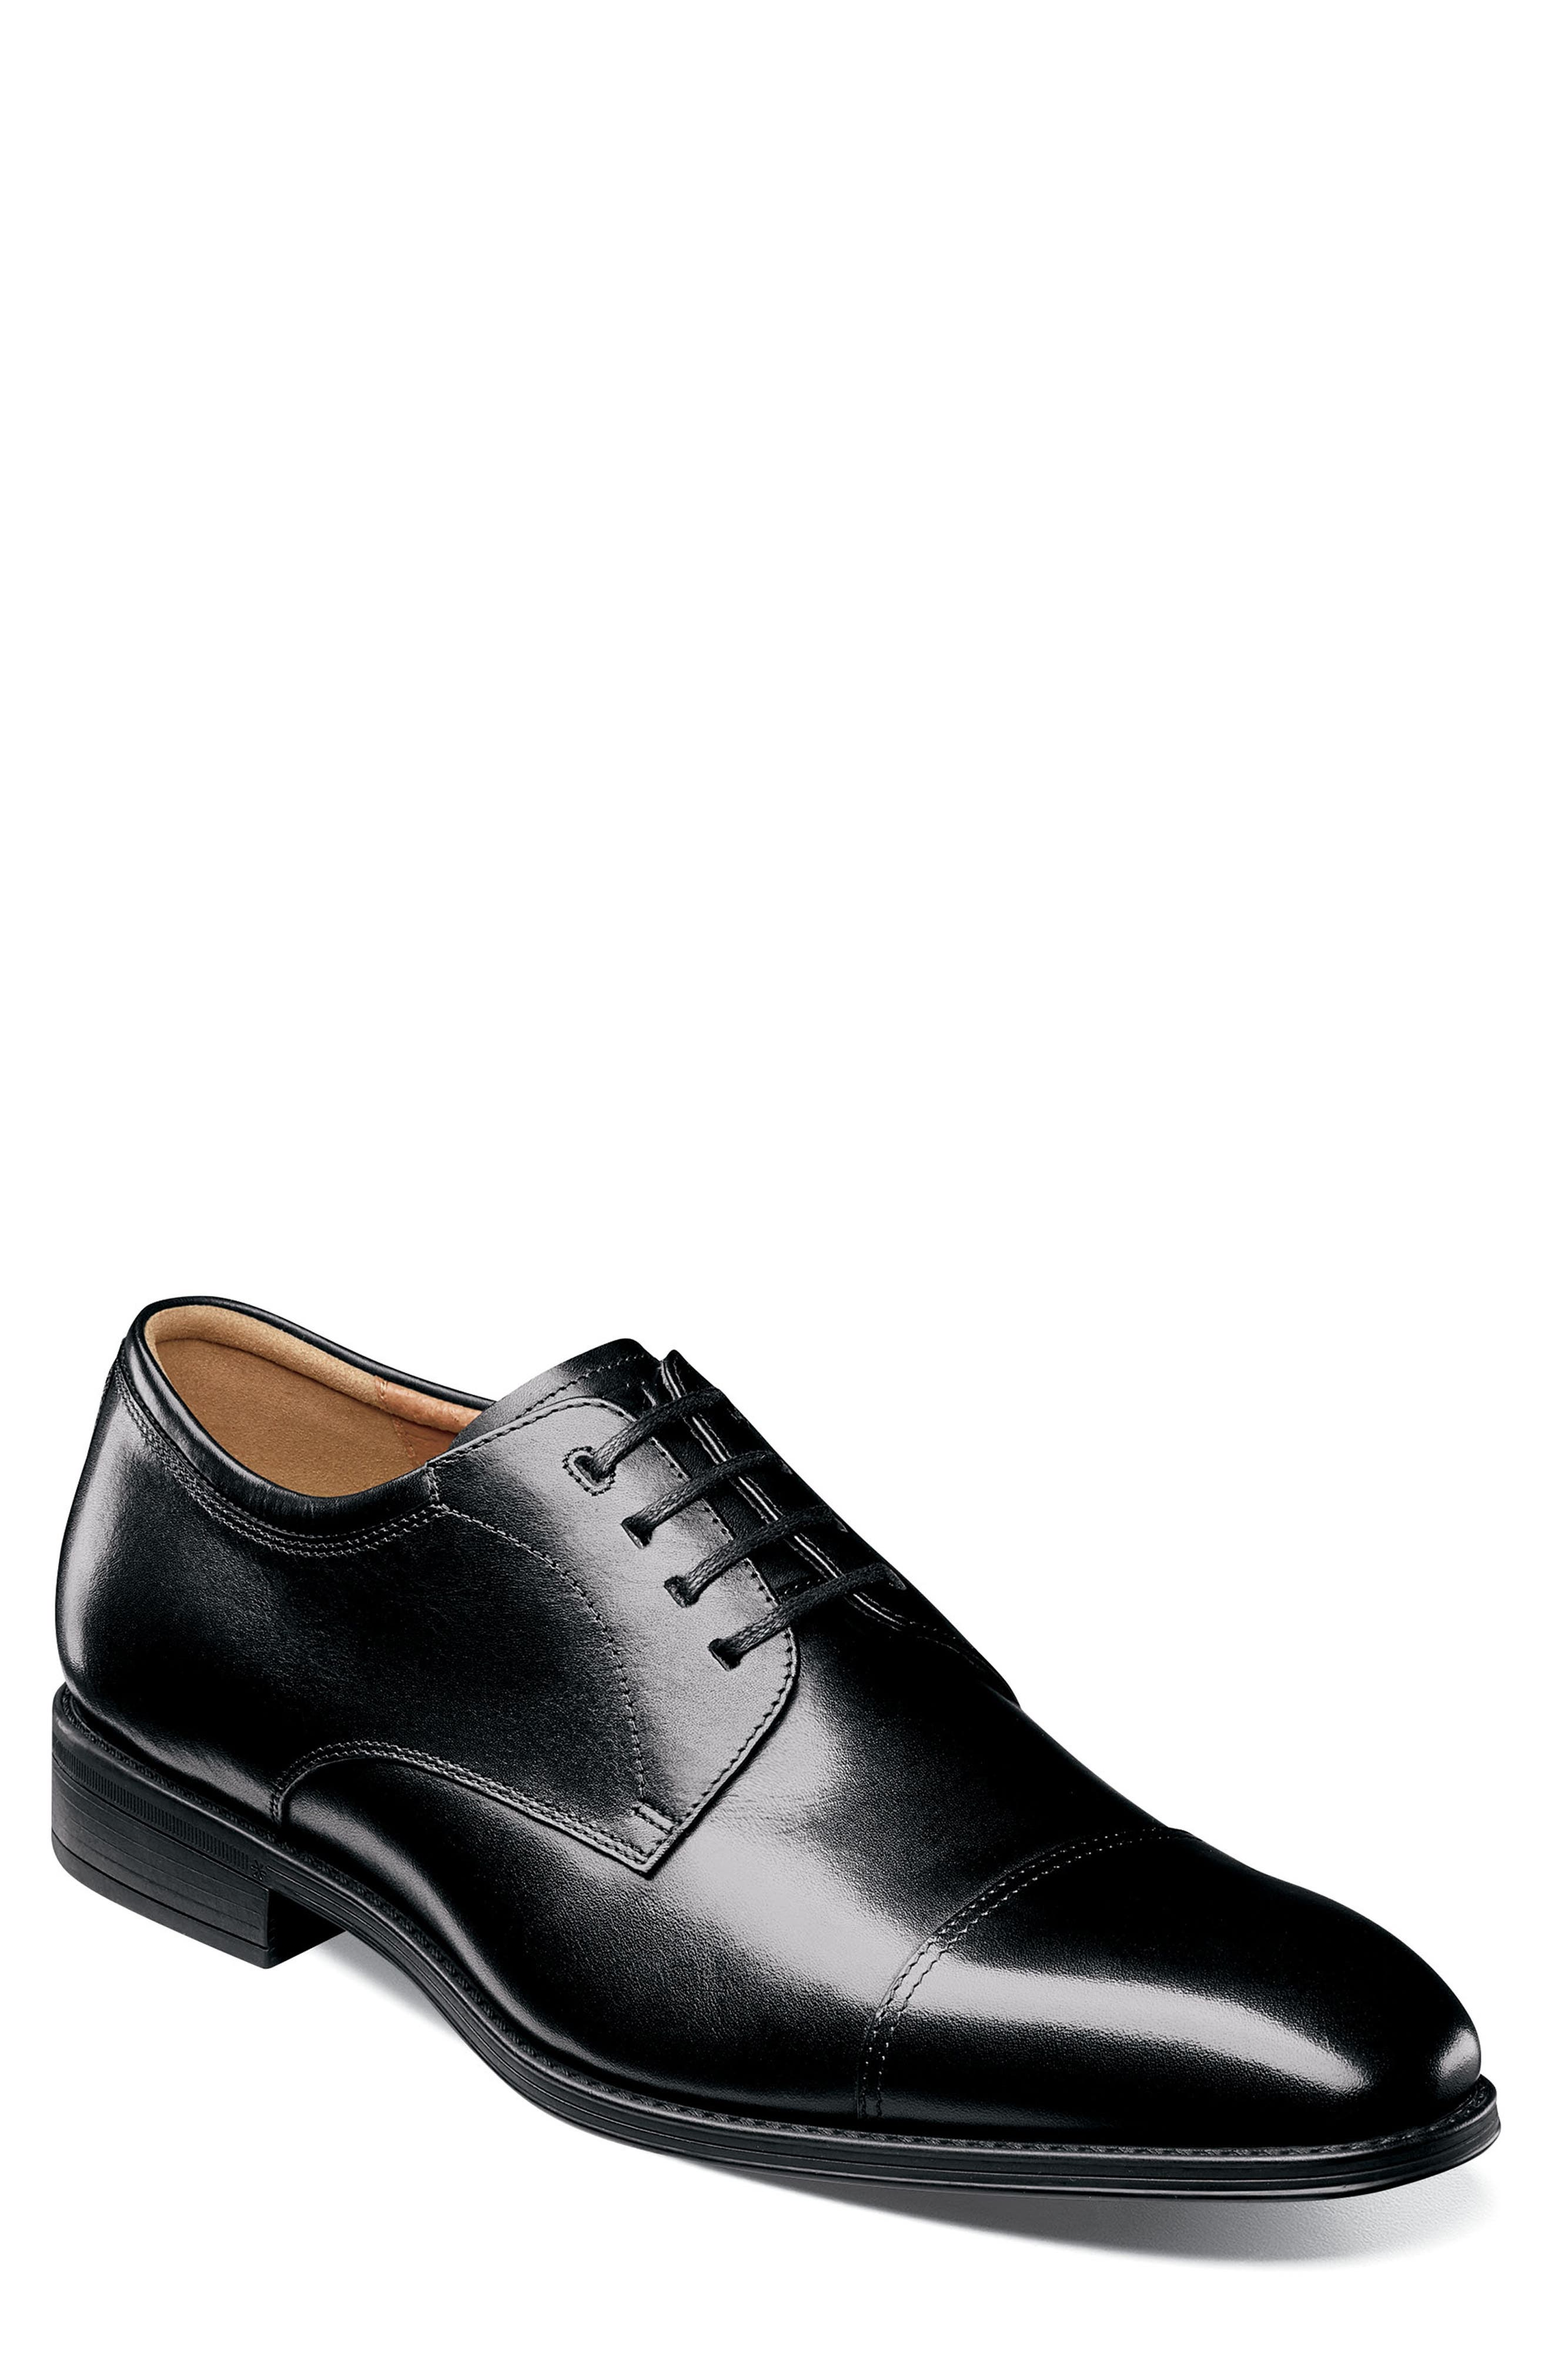 Men's Dress Shoes | Nordstrom